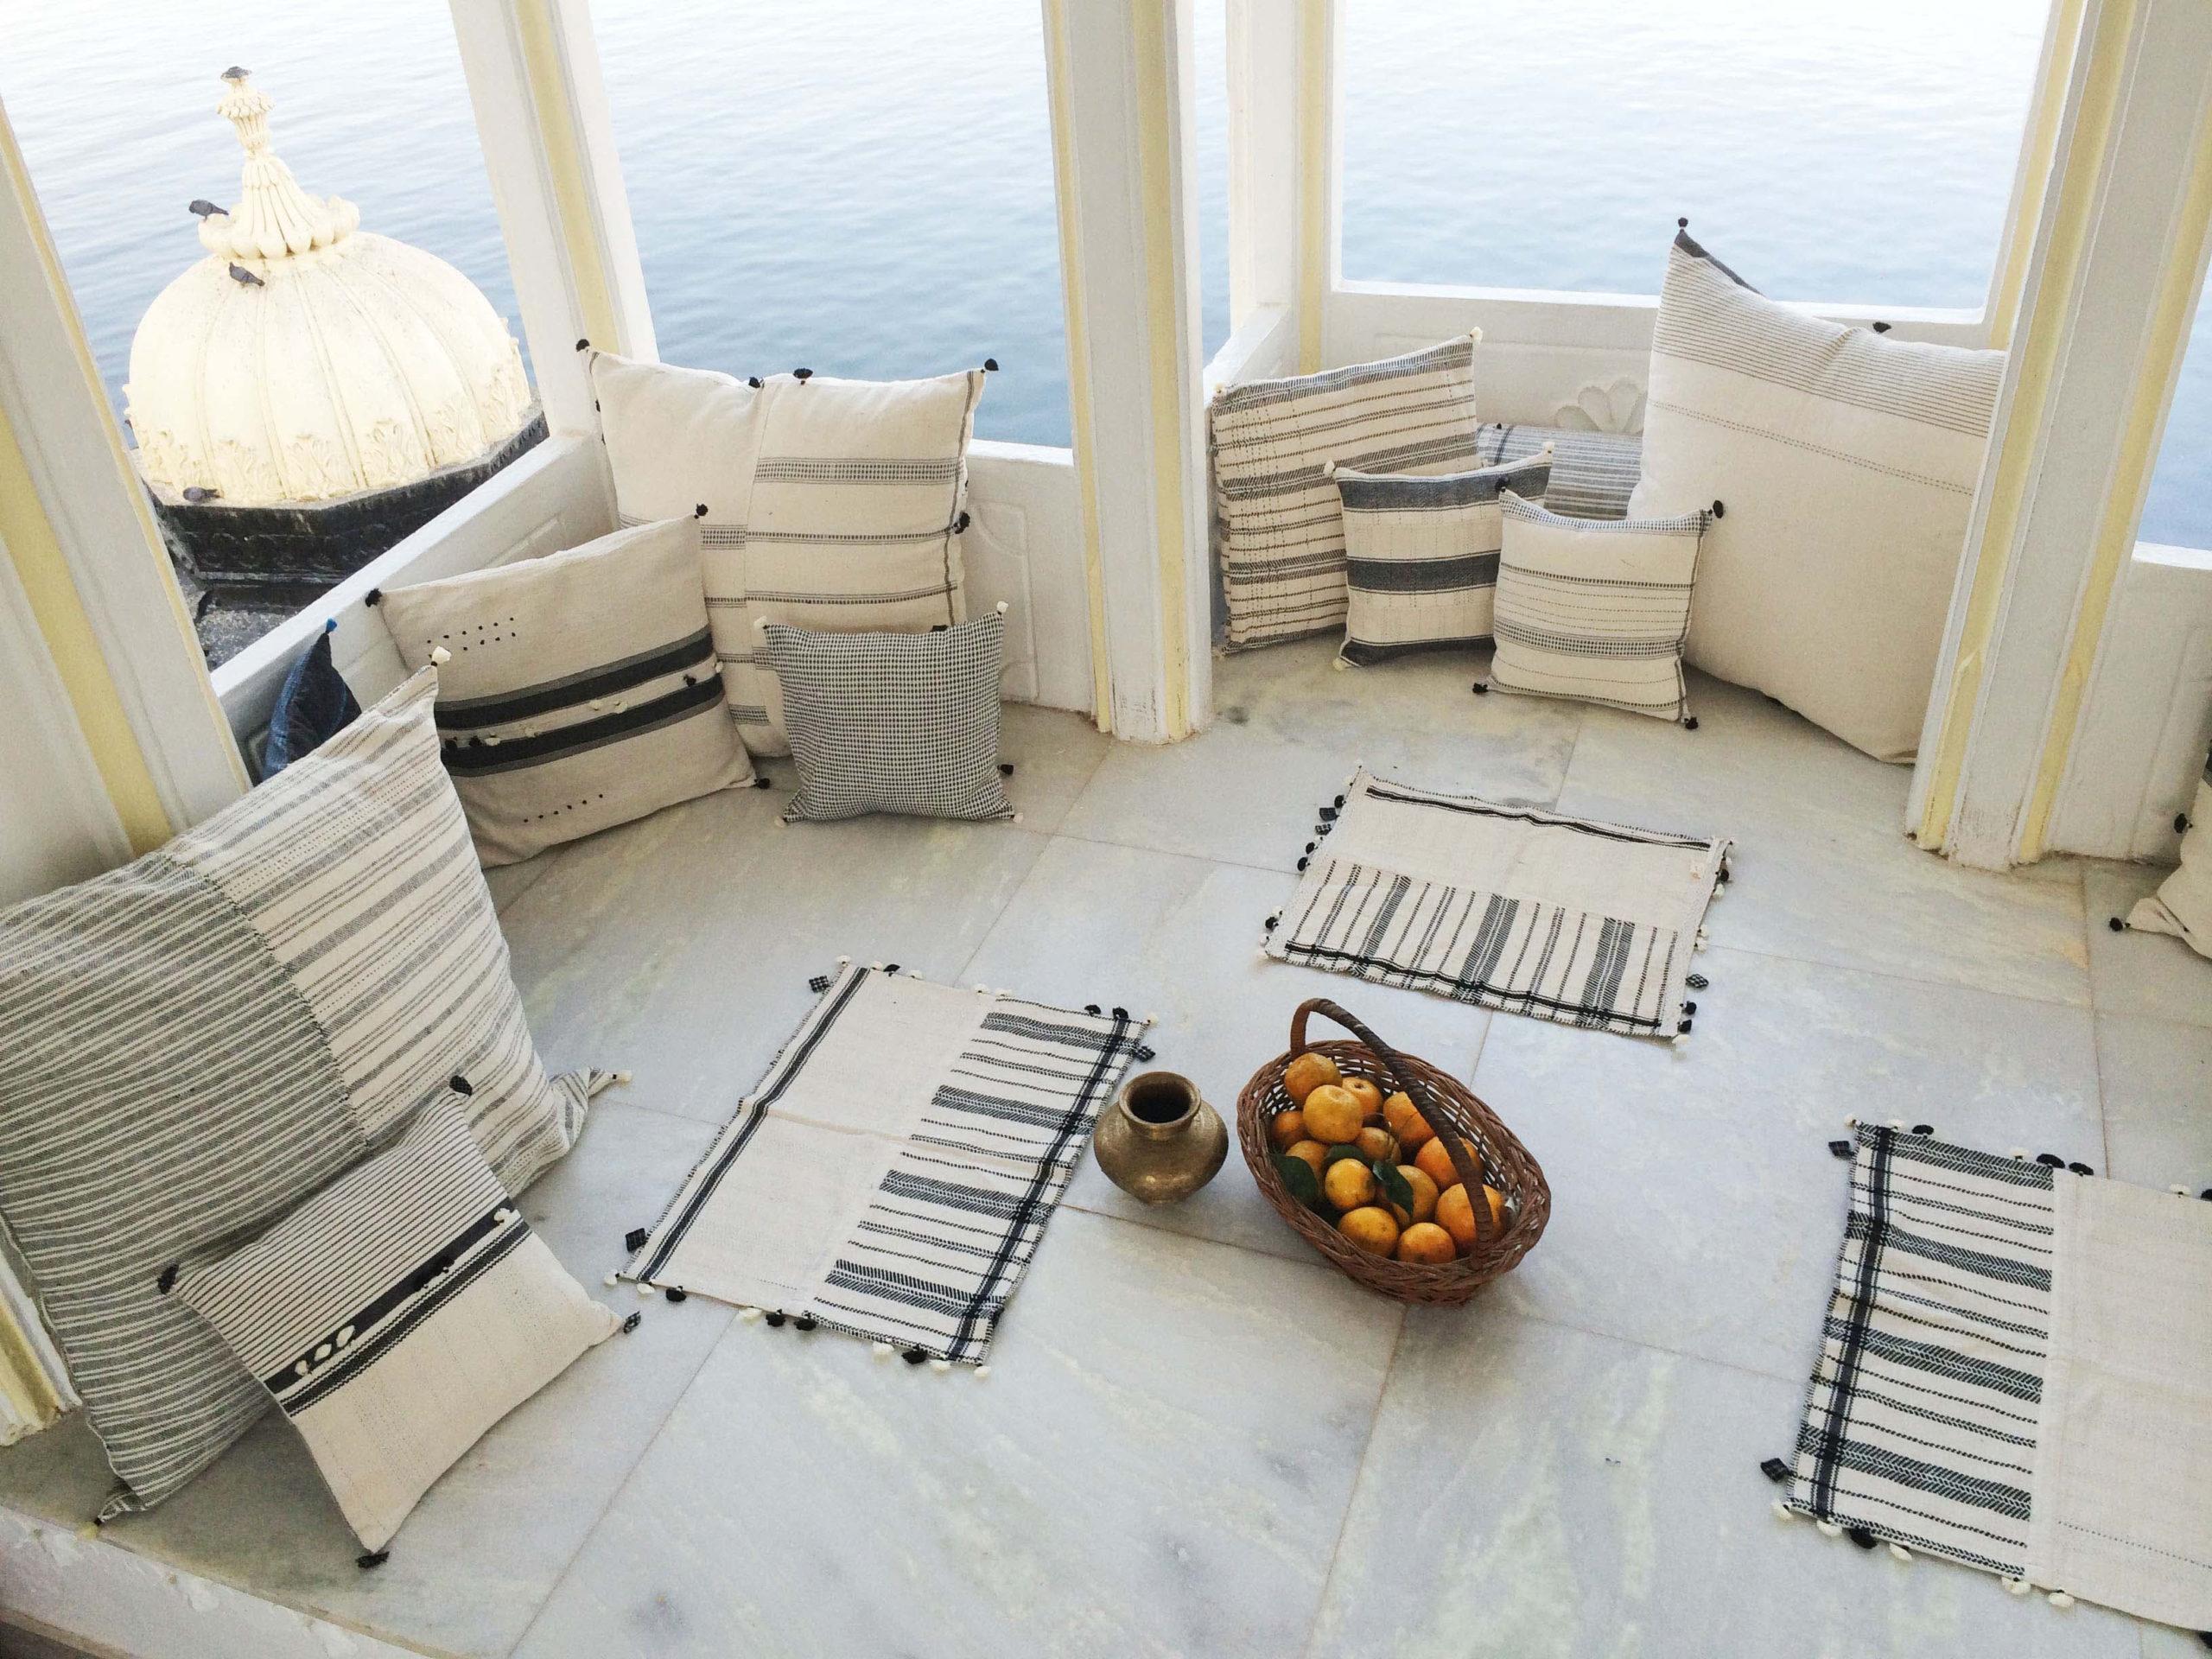 Injiri Bed Pillows, Coasters and Napkins